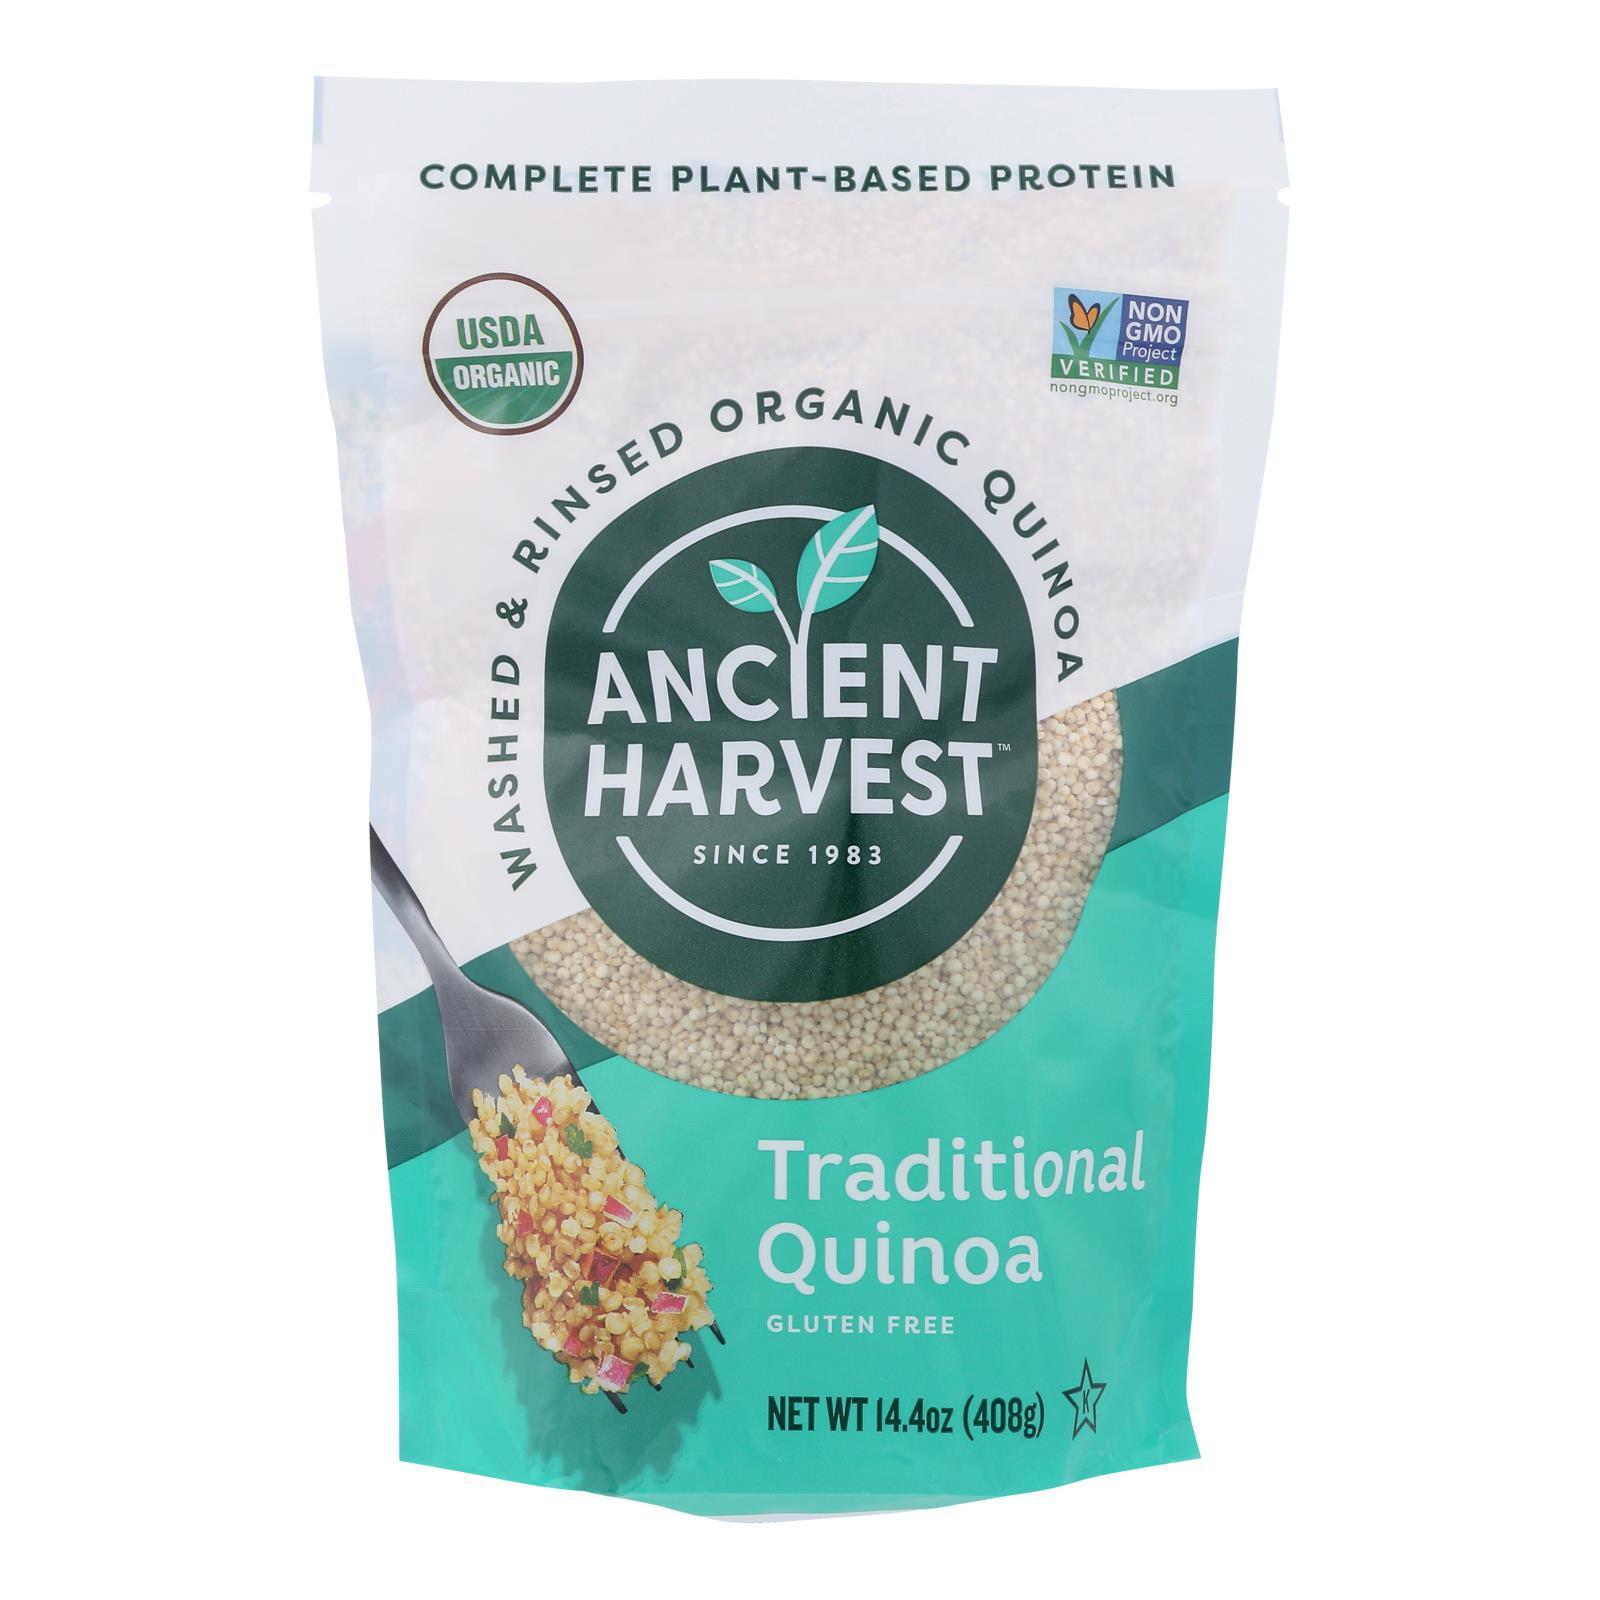 Ancient Harvest Quinoa - Organic - Traditional - Whole Grain - Gluten Free - Case of 12 - 14.4 oz